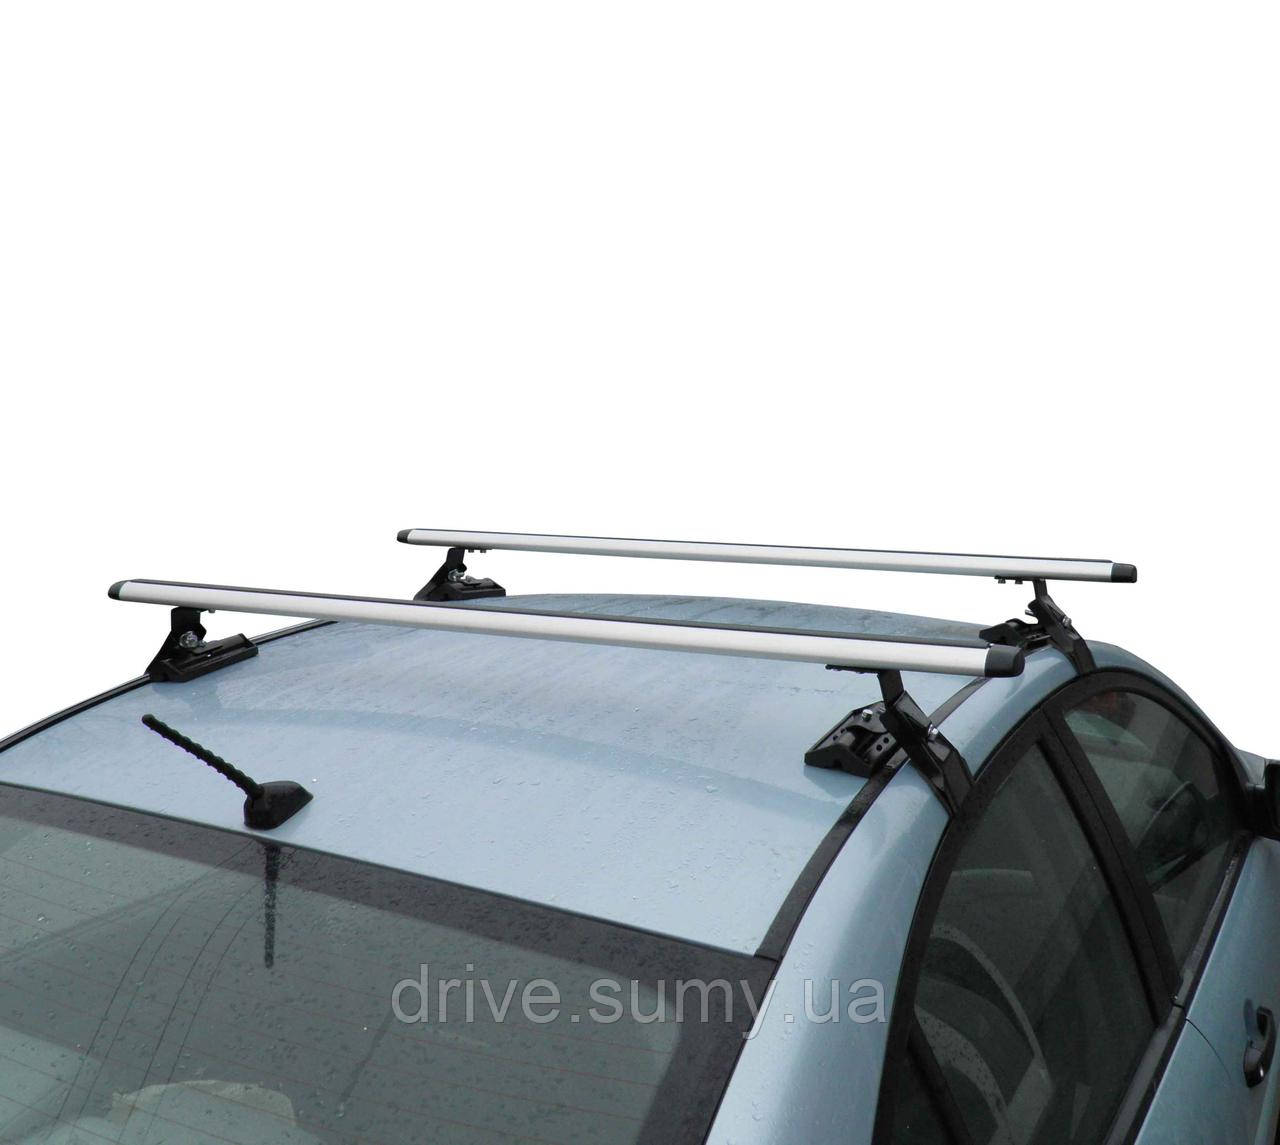 Багажник Hyundai Accent 2011- за дверной проем Aero